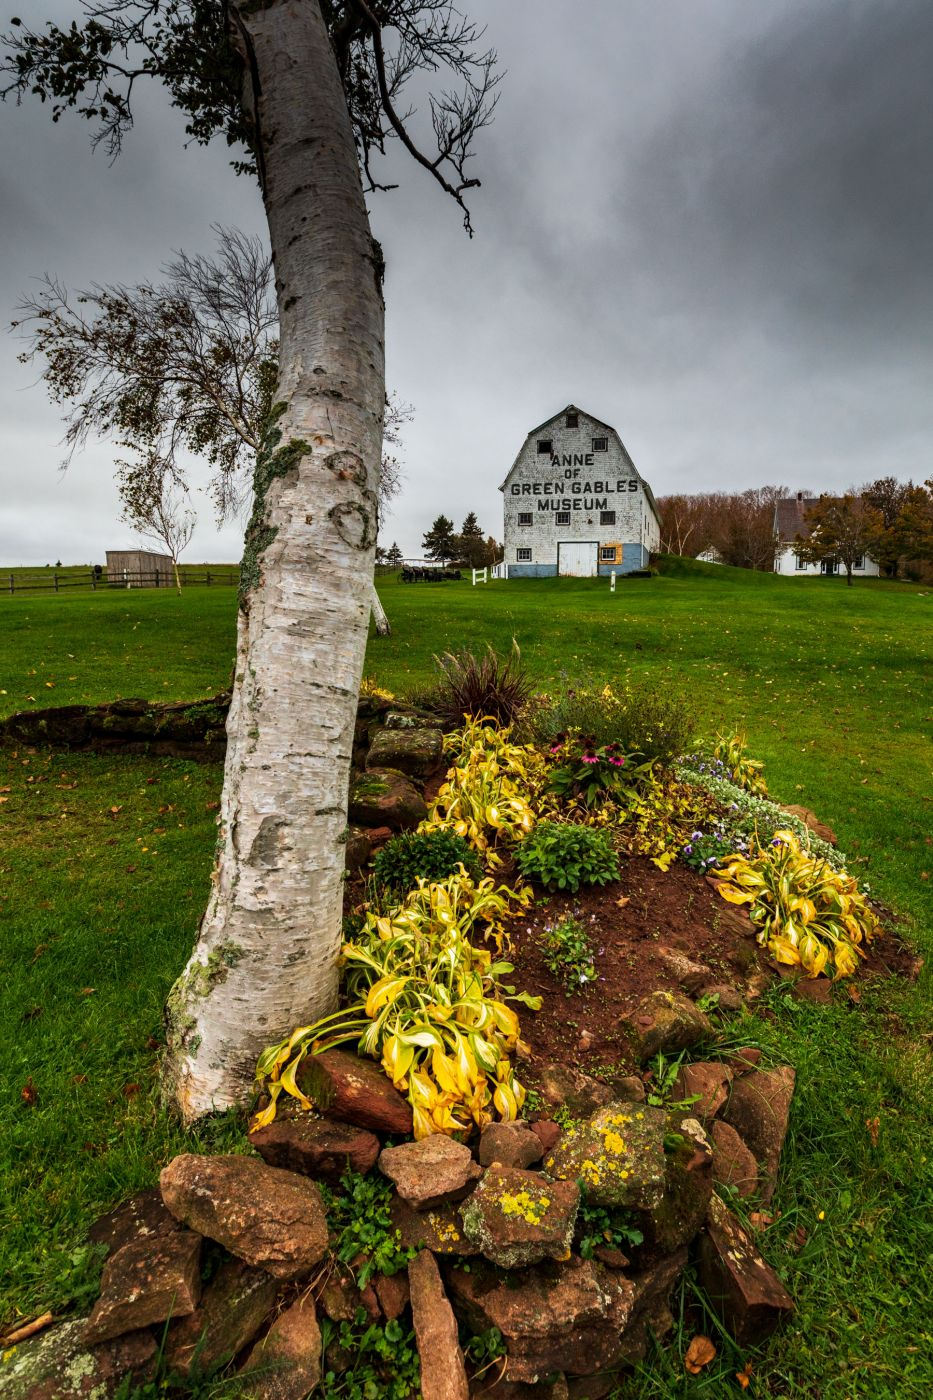 Anne of Green Gables Museum Barn Prince Edward Island, Canada